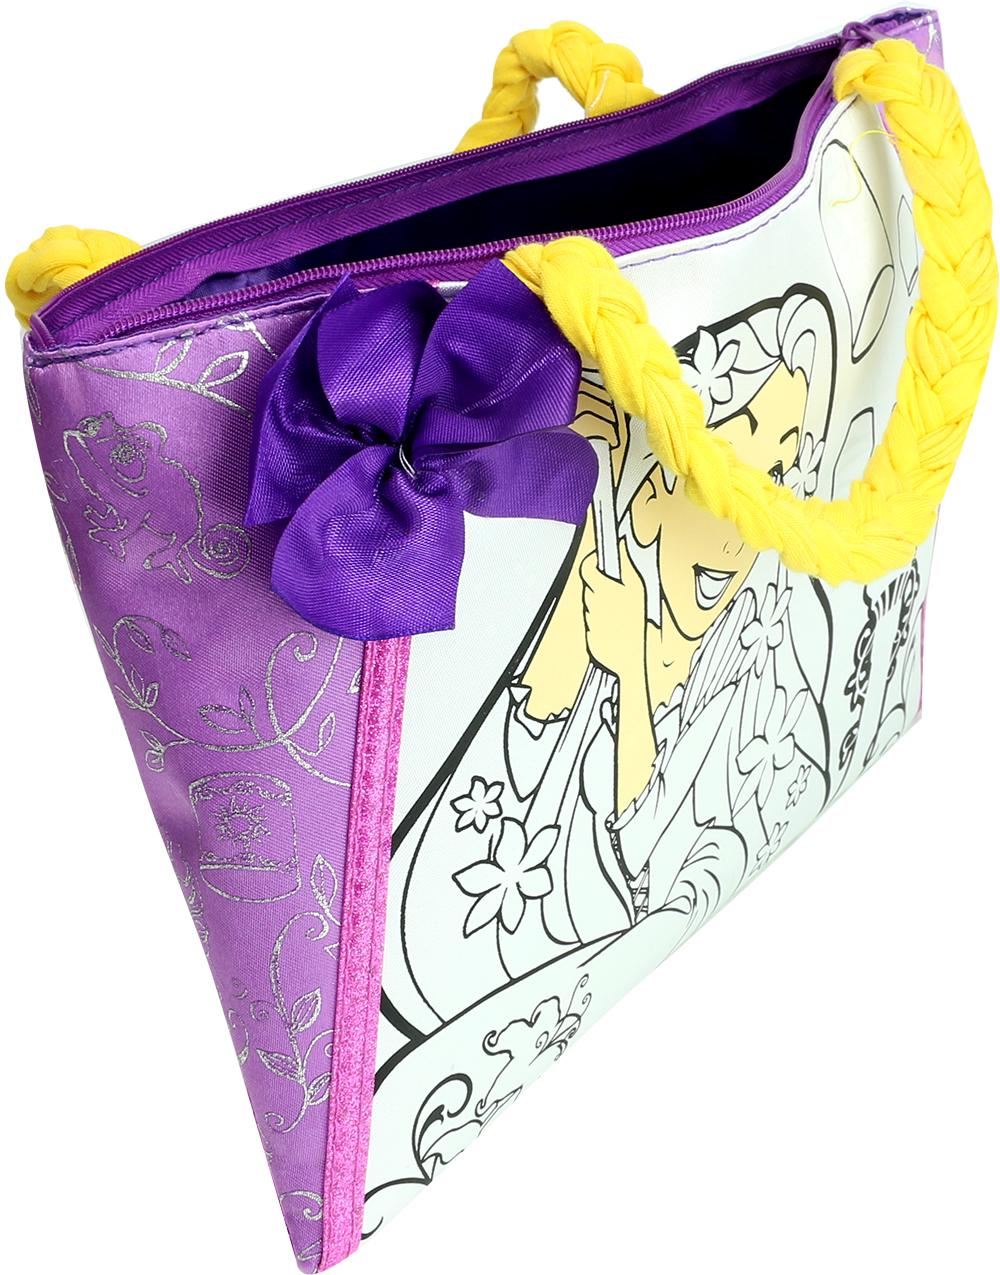 Purse Color Style Rapunzel Princess N Disney 0nN8wOPkXZ